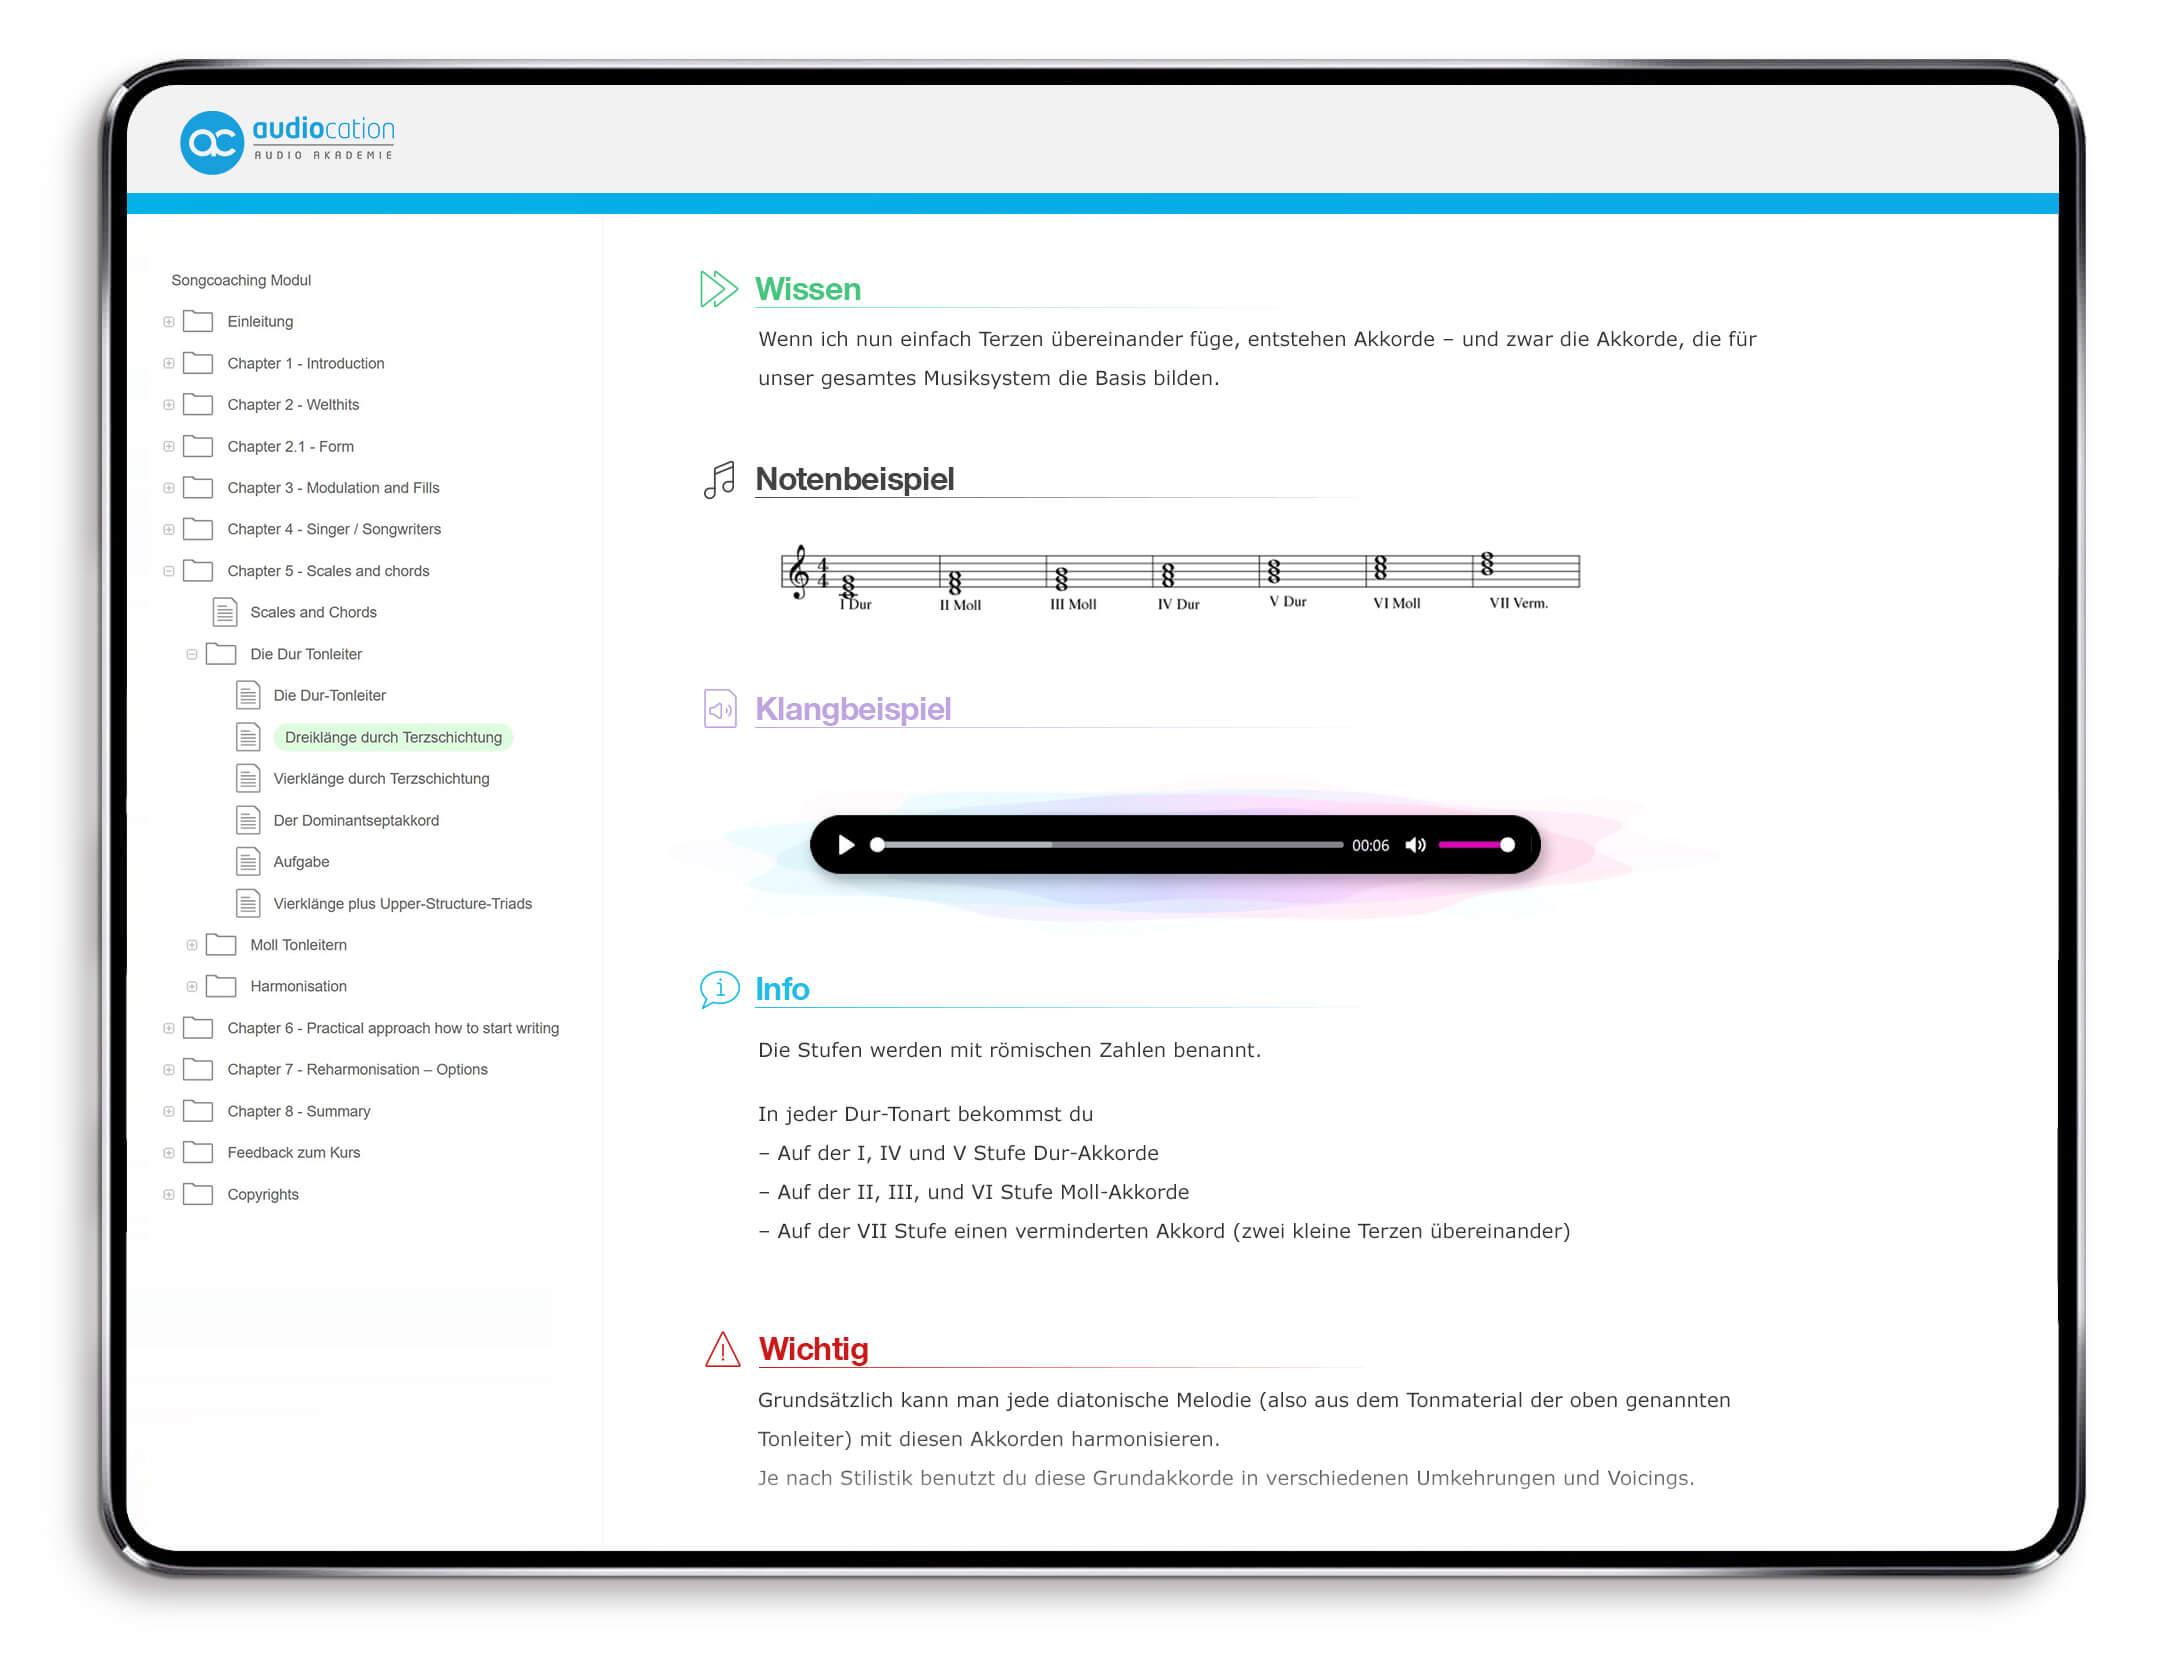 Auszug Songcoaching Onlinekurs Audiocation